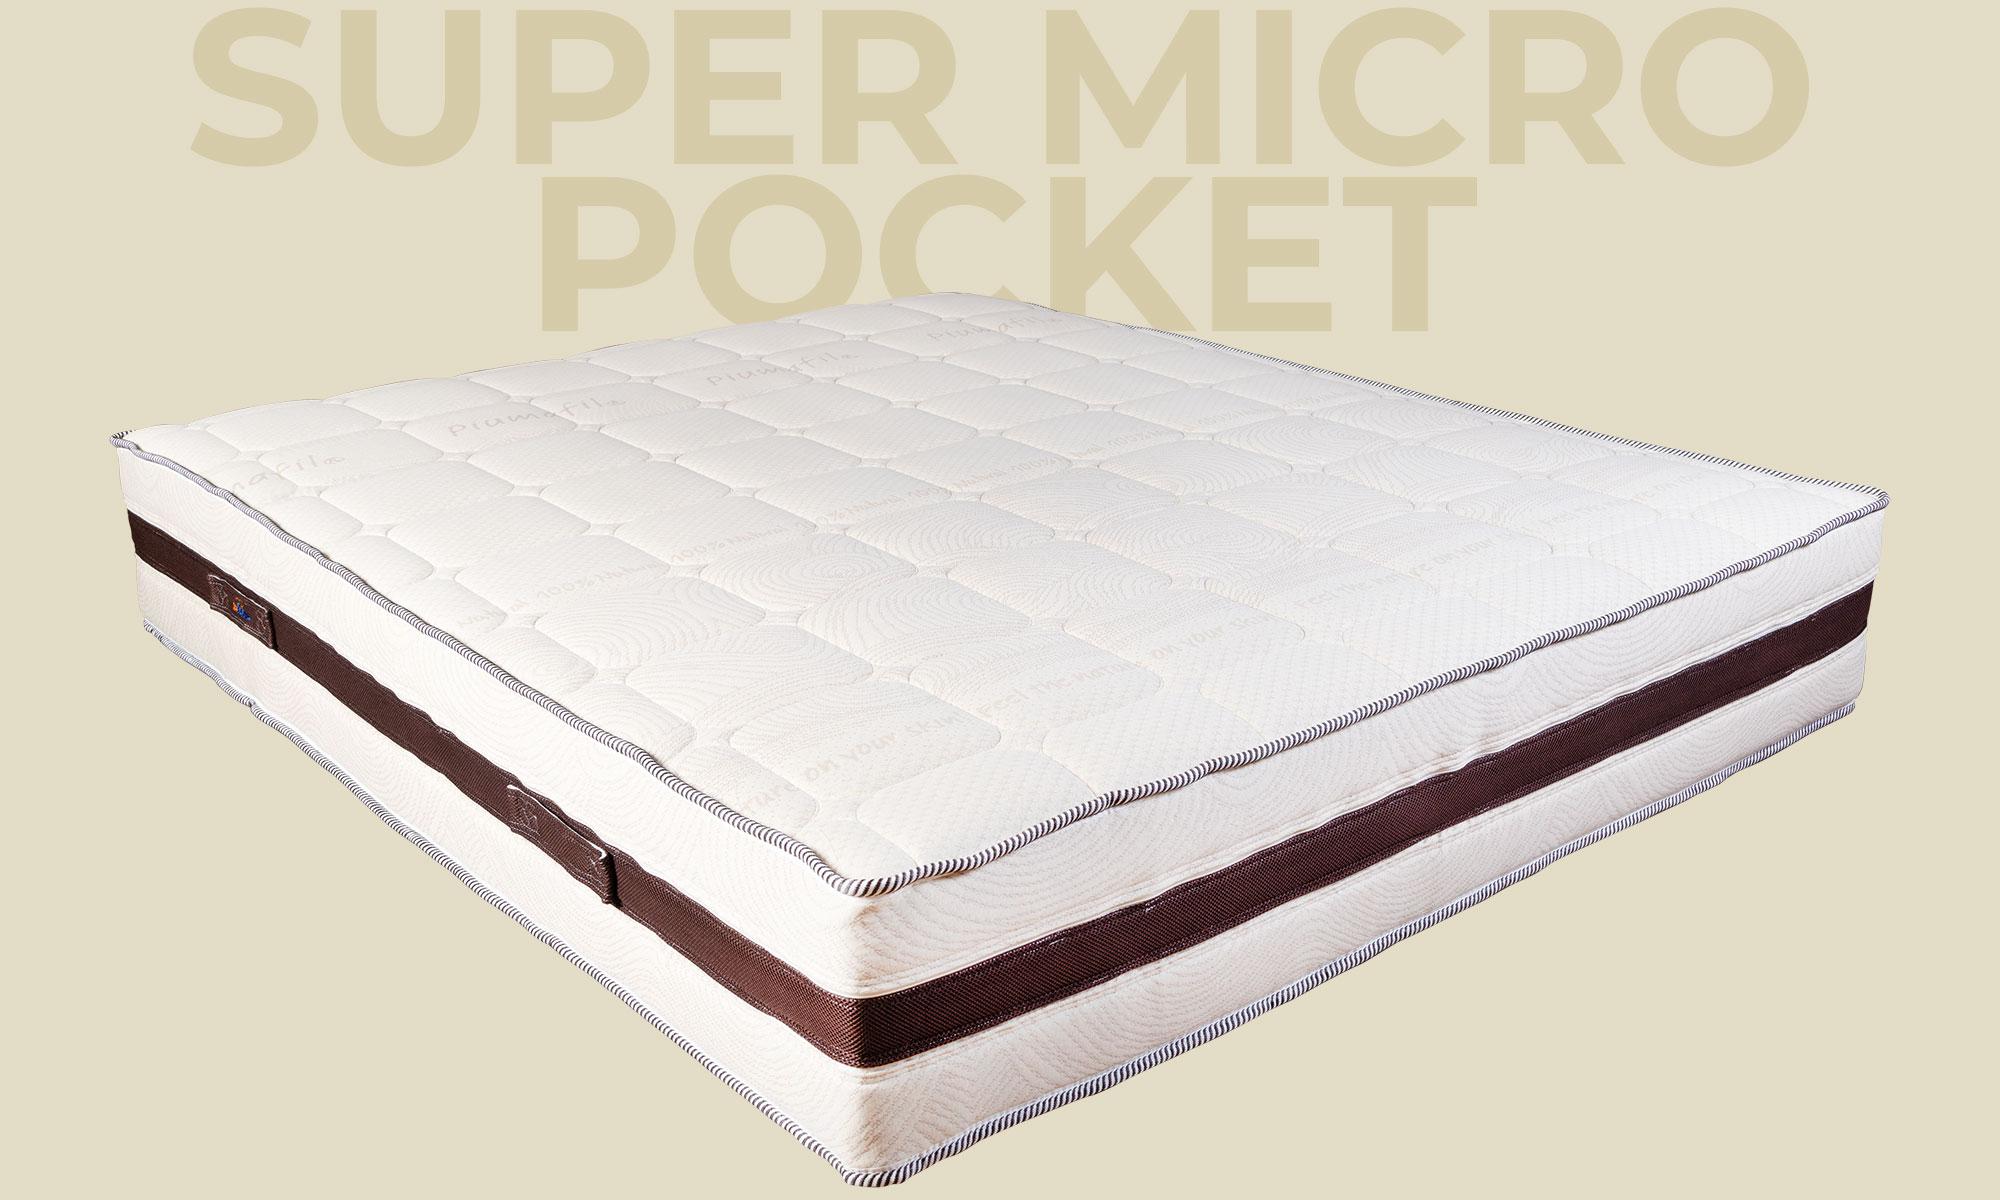 supermicro-pocket_testo